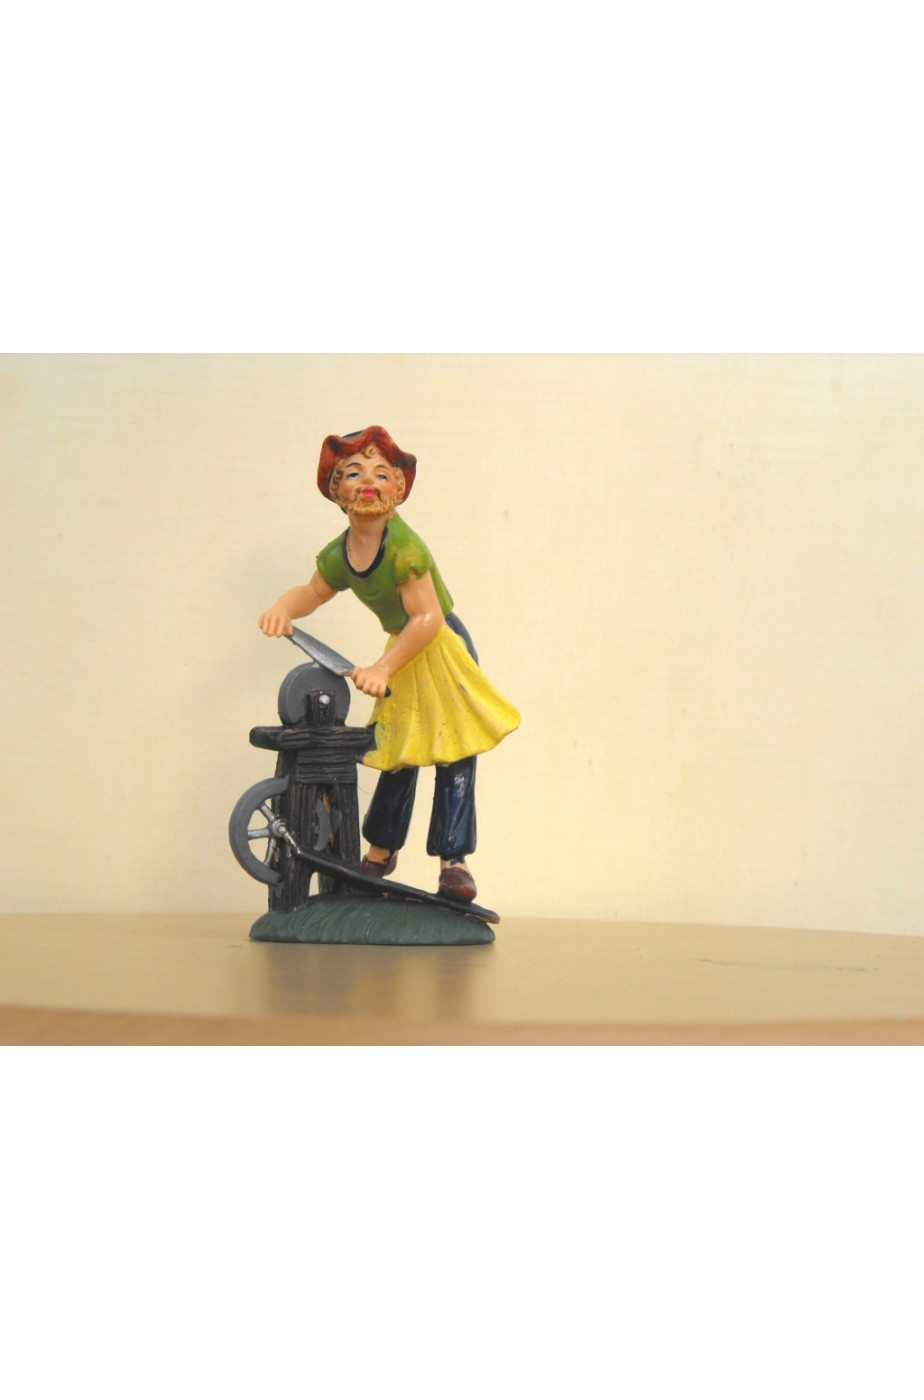 Figurina Presepe in plastica (cm 7 o 10 s.q.) Arrotino